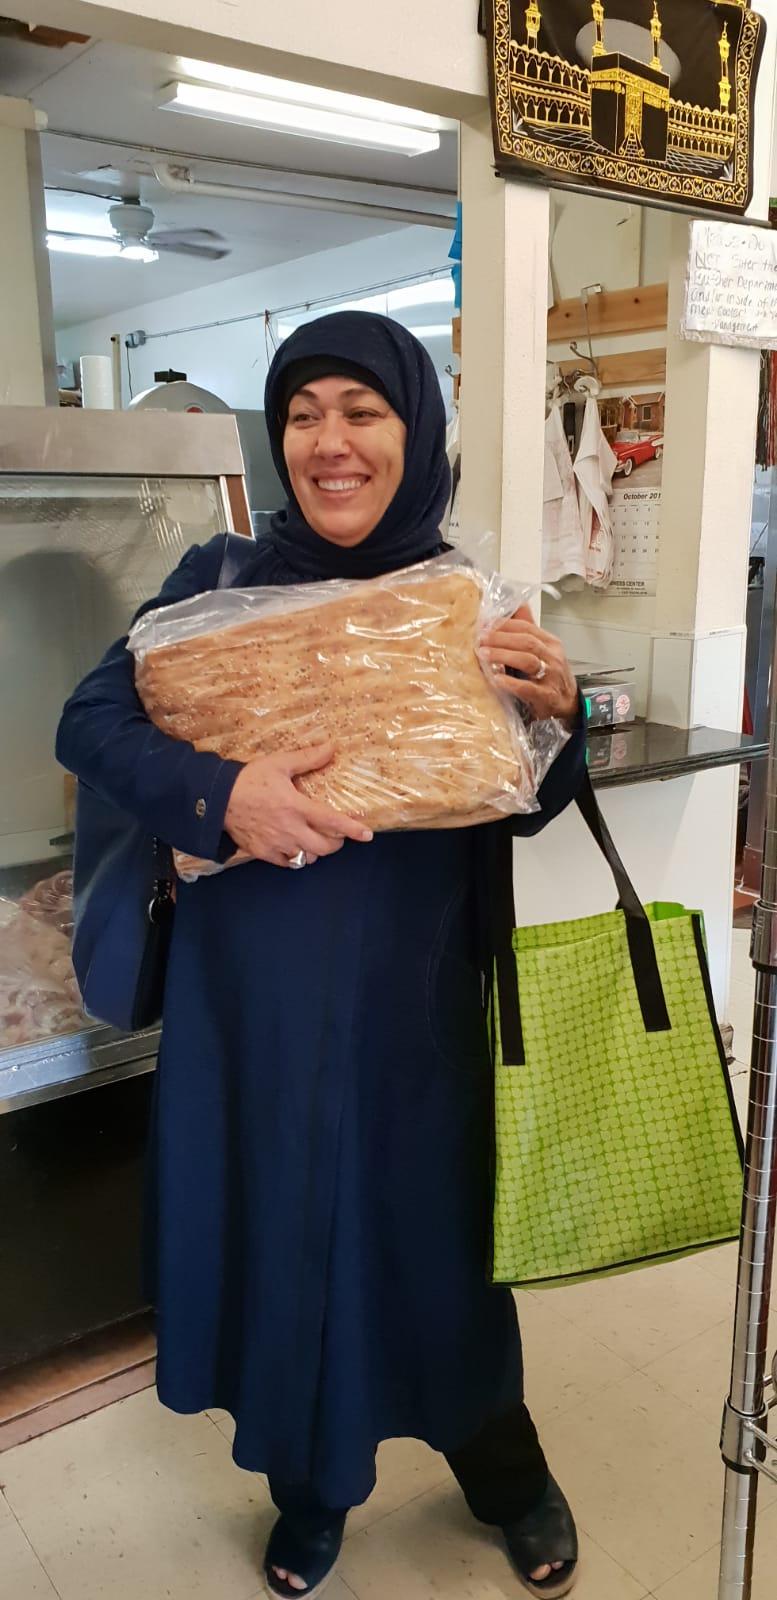 Basema hugging the yummy Afghani feshly baked bread